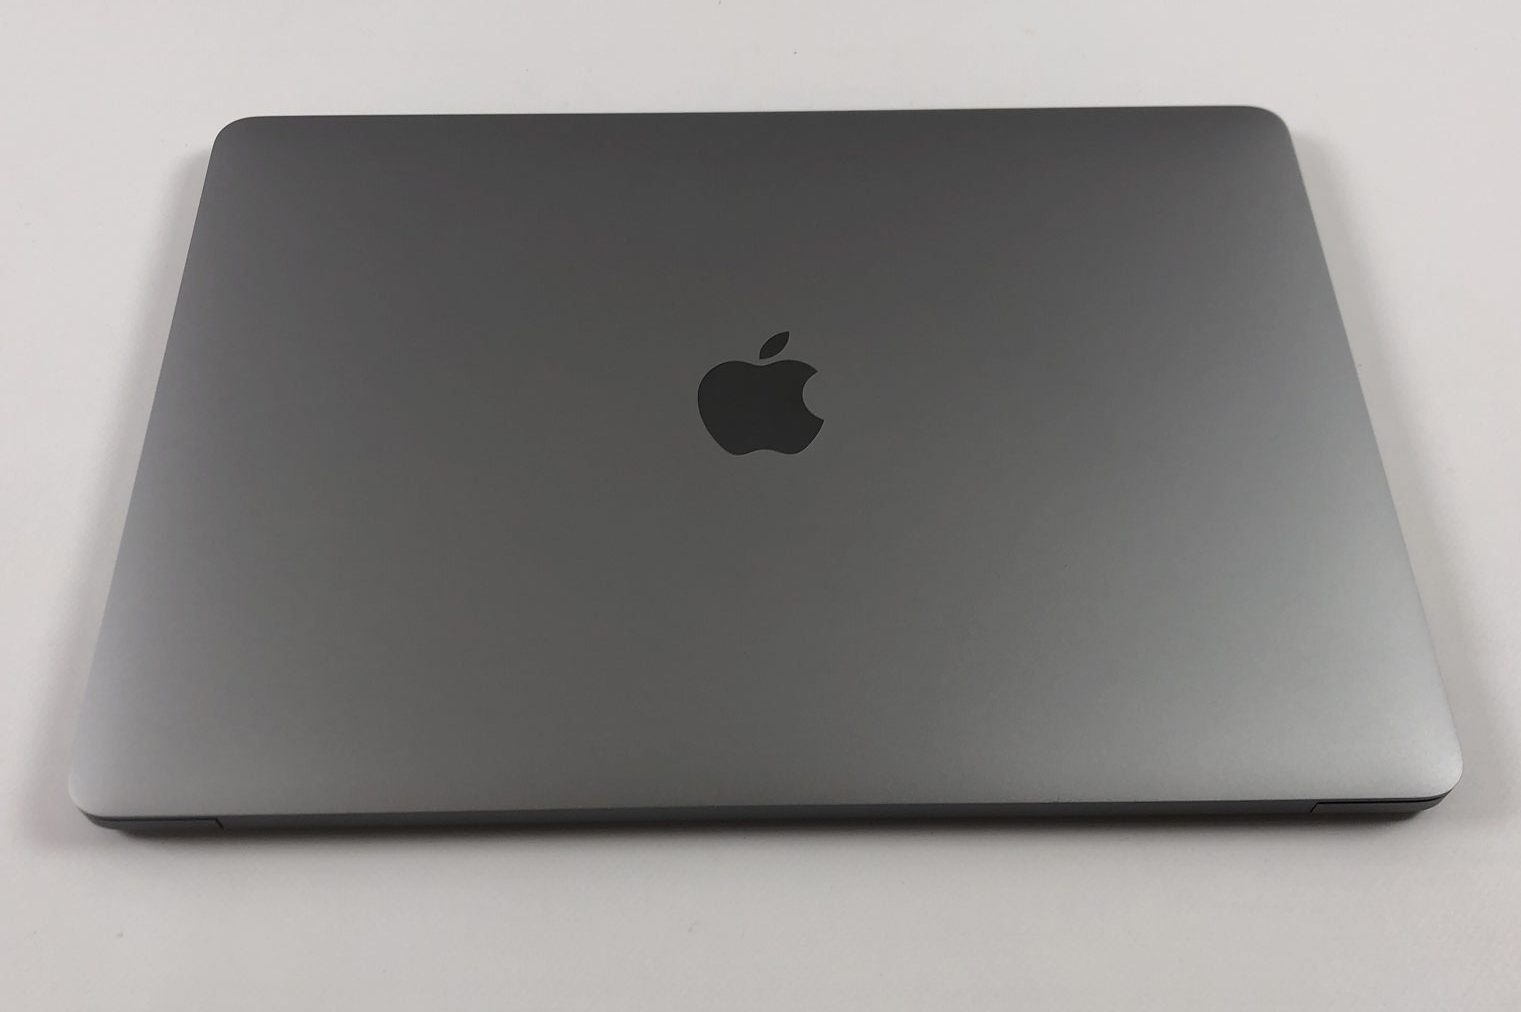 "MacBook Pro 13"" 4TBT Late 2016 (Intel Core i5 2.9 GHz 8 GB RAM 512 GB SSD), Space Gray, Intel Core i5 2.9 GHz, 8 GB RAM, 512 GB SSD, bild 2"